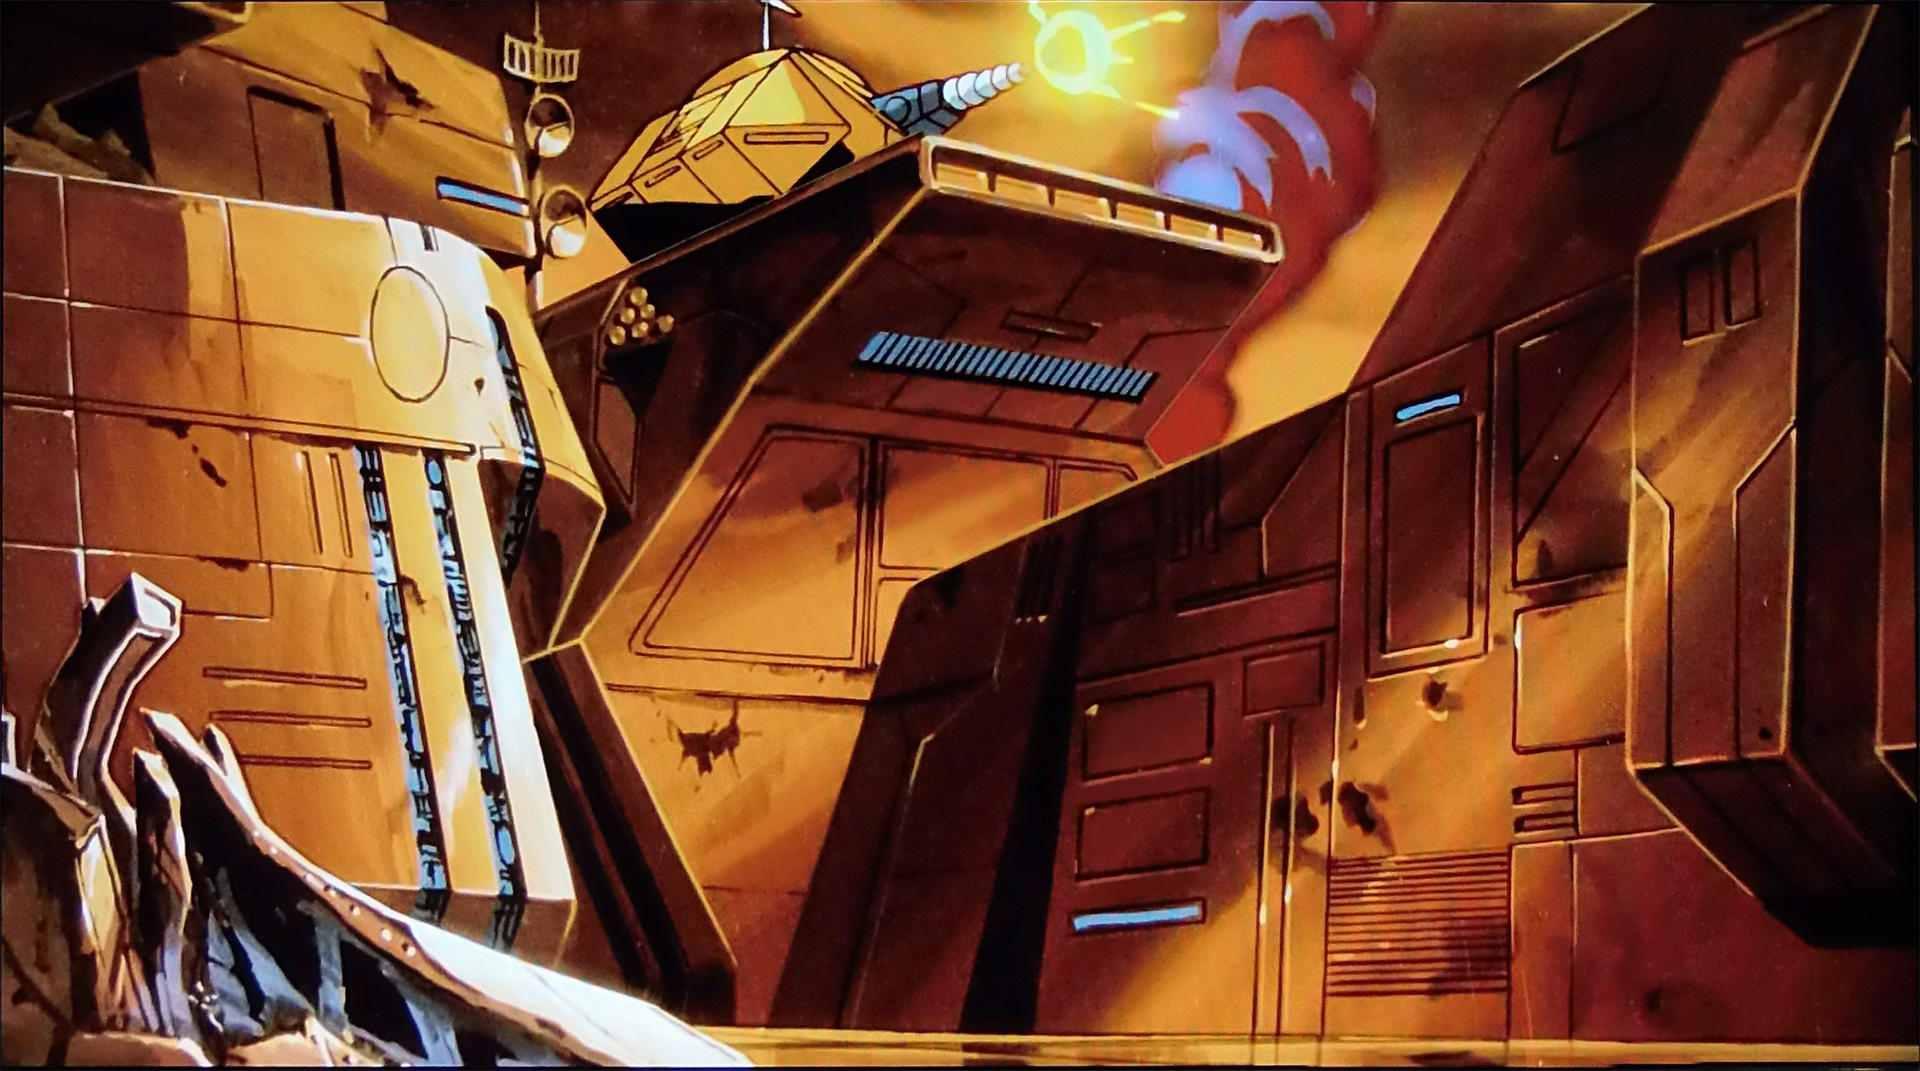 Transformers the movie cartoon